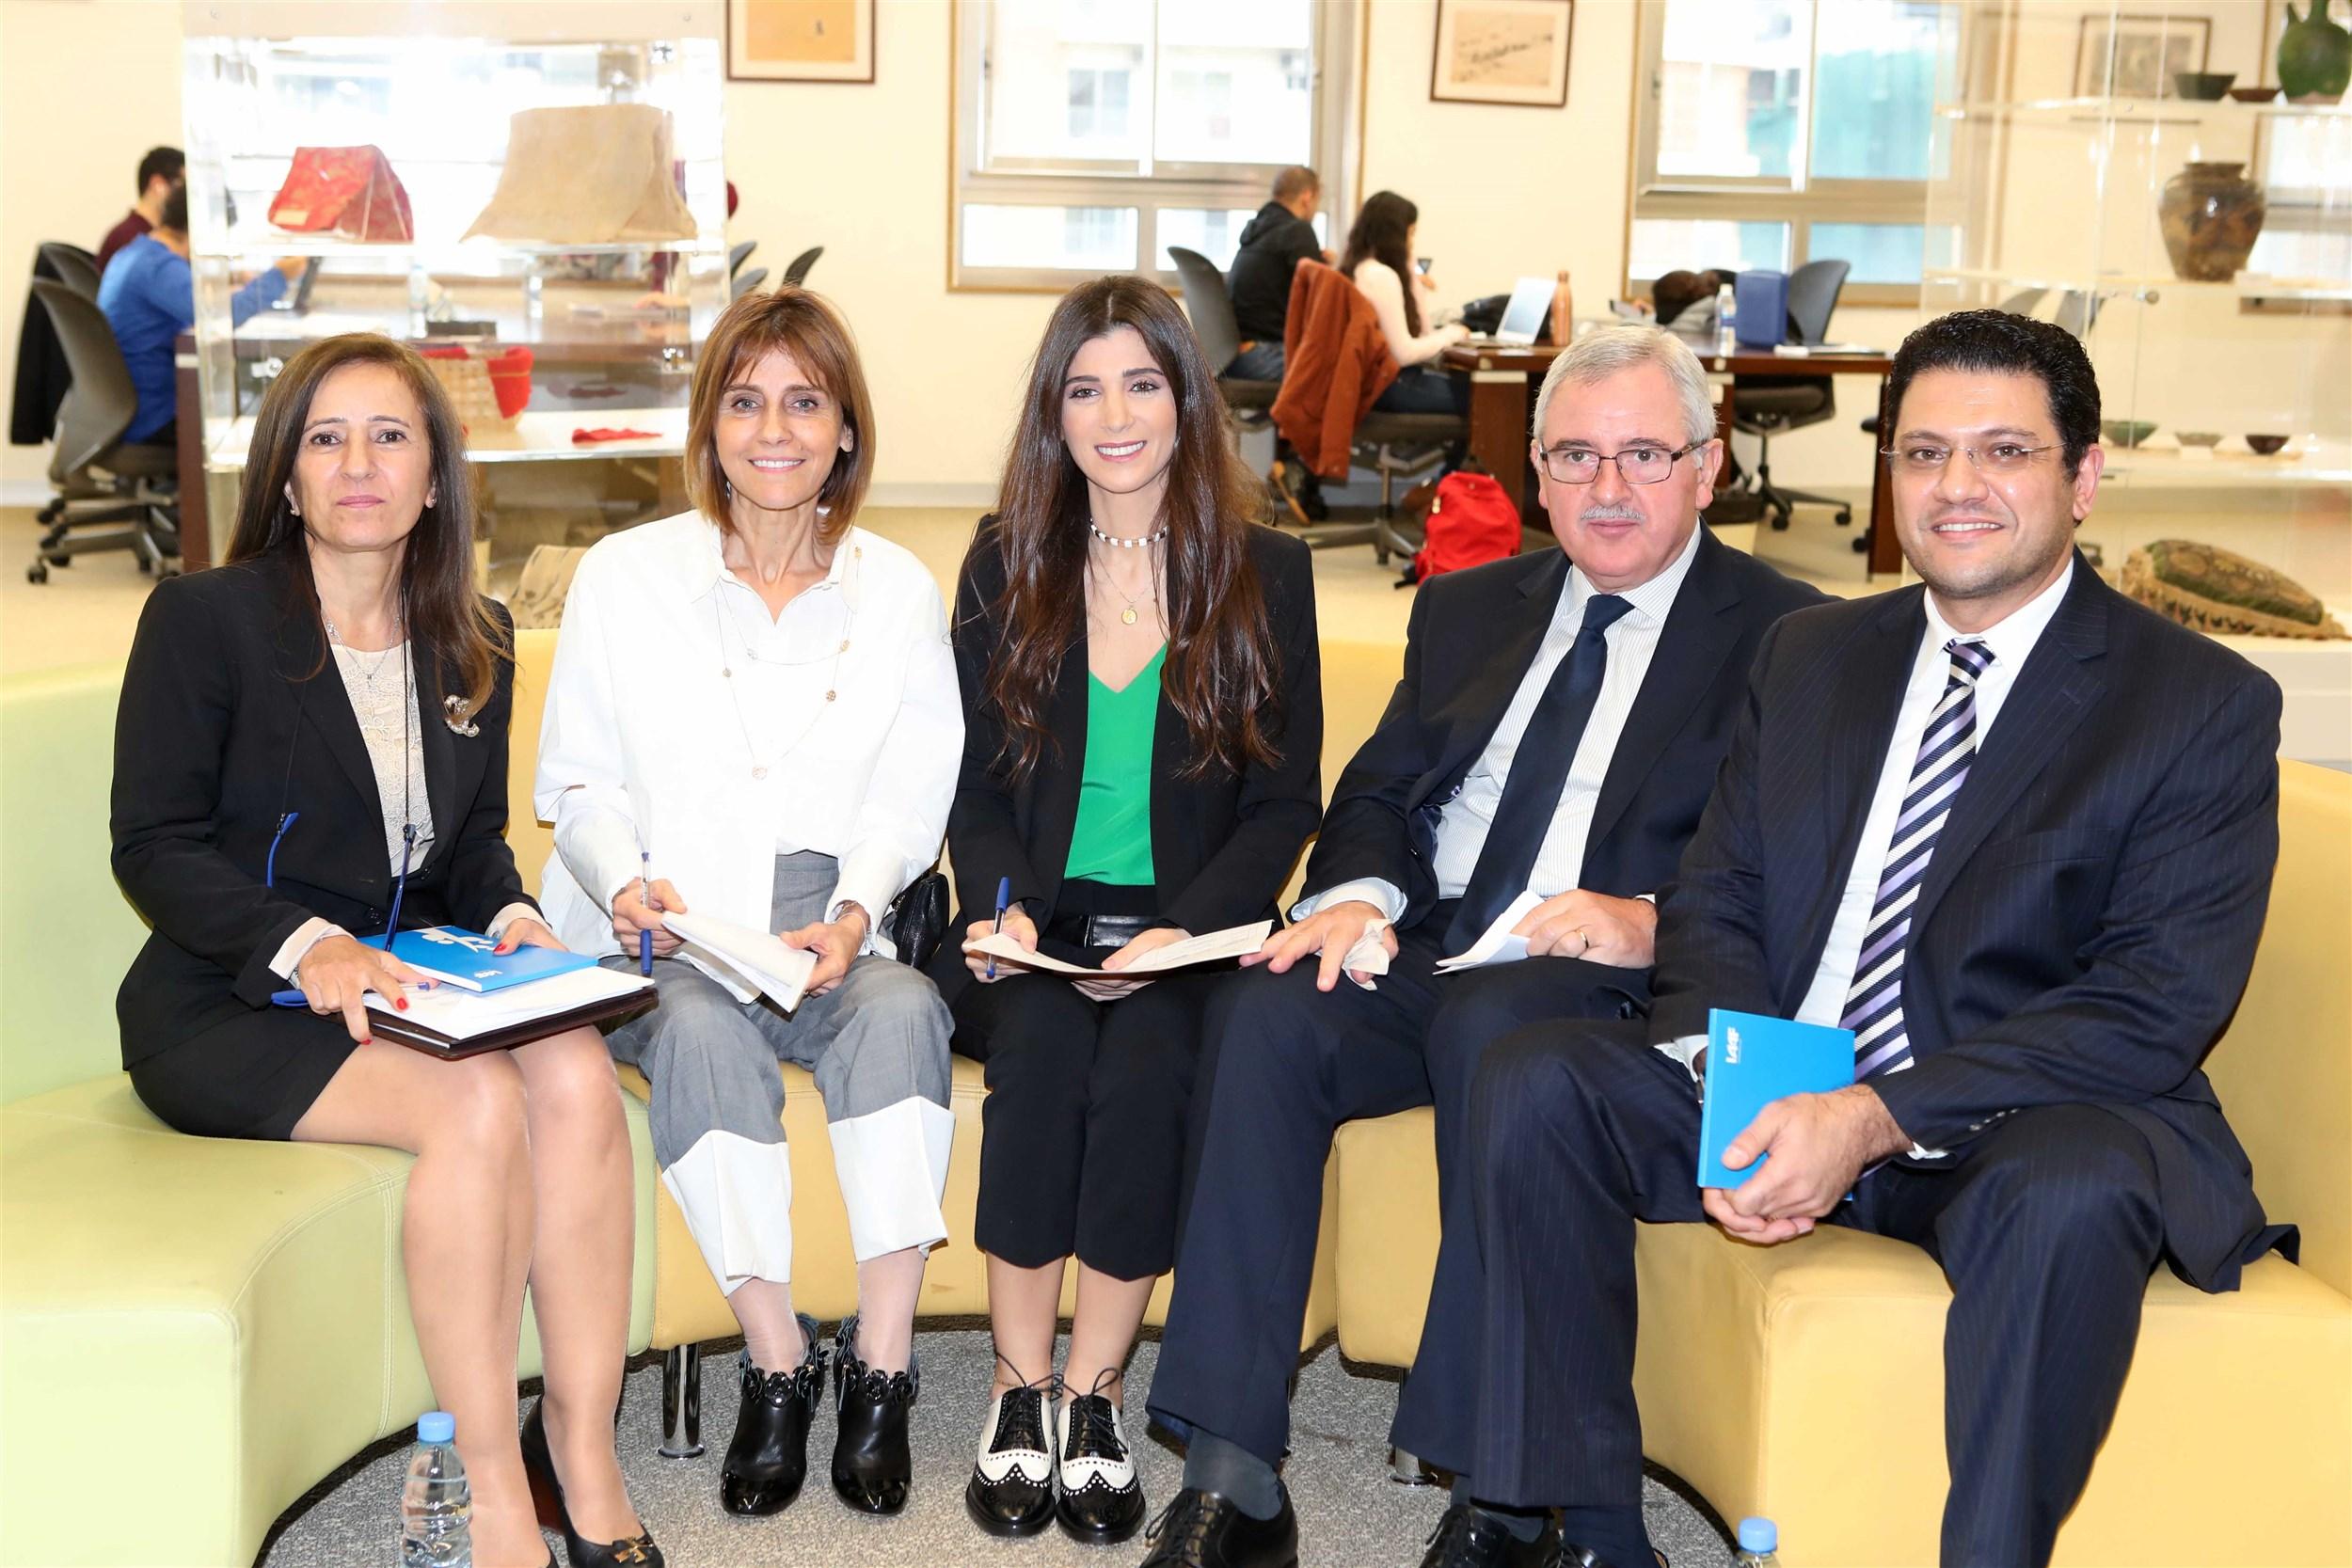 the members of the esteemed jury dr. silivia kerkolian, mrs. randa daher, mrs. inas al jarmakani, minister jean oghassapian and dr. amin abi aad.